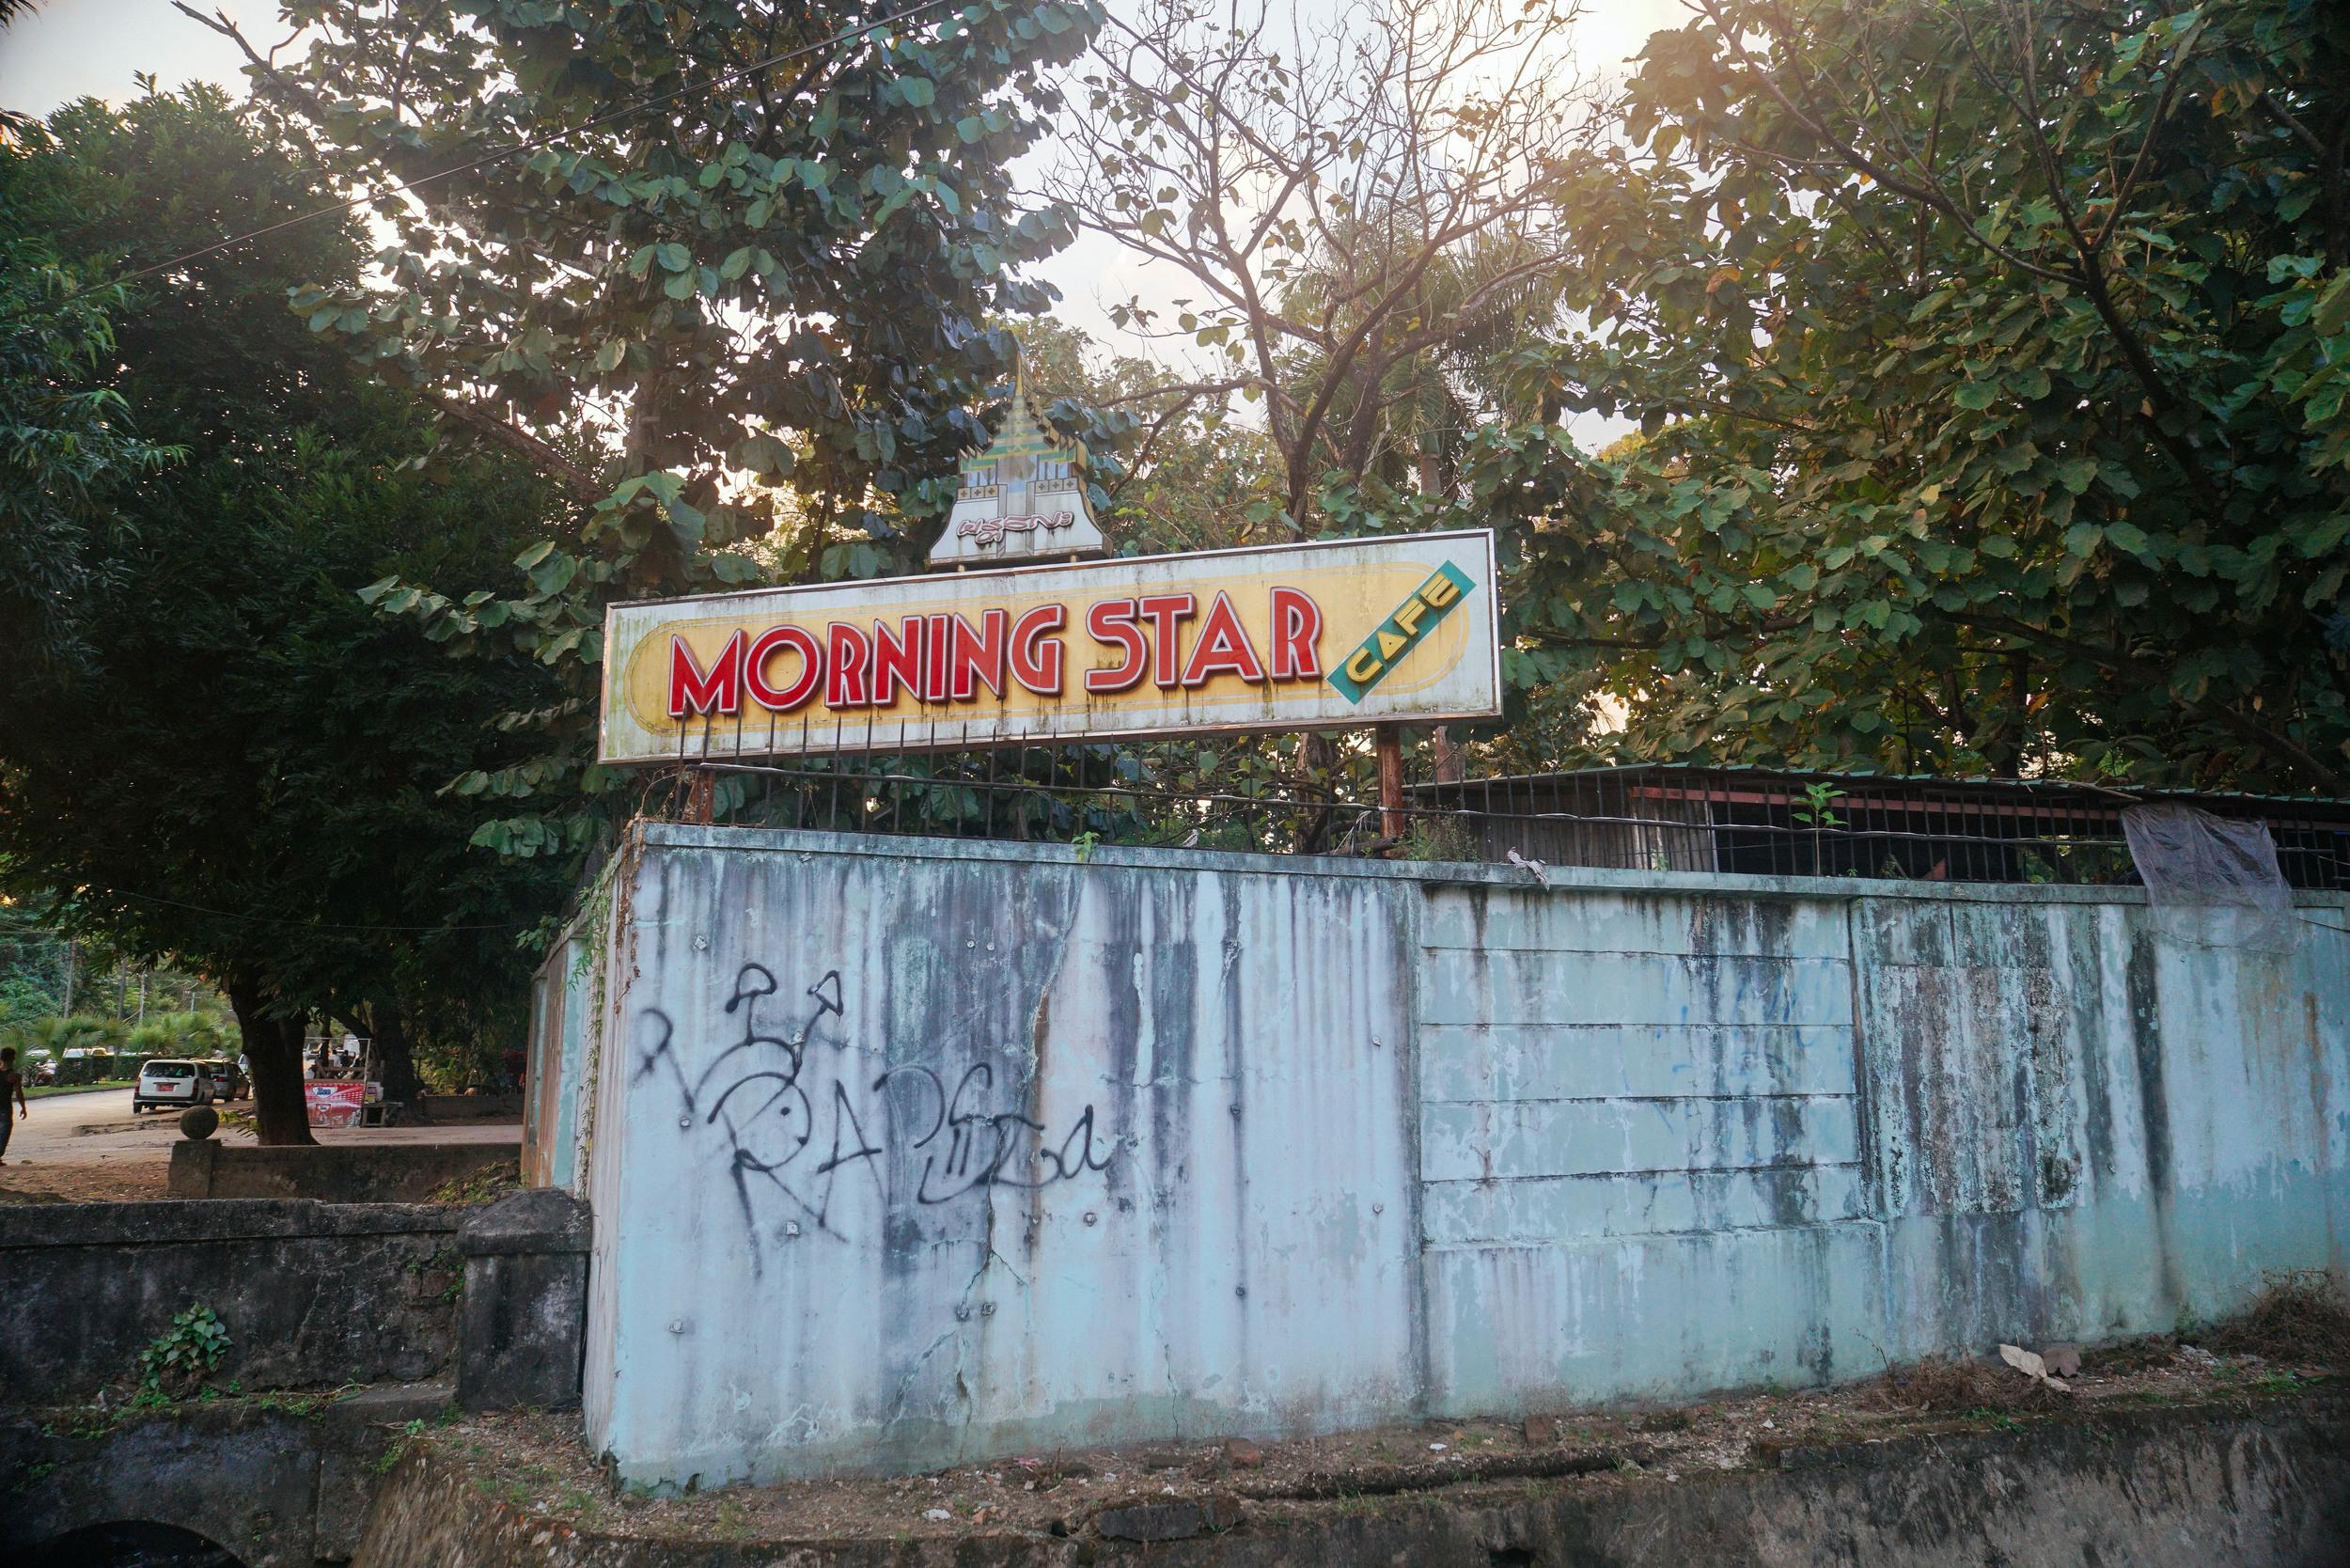 YGN-13_MorningStar-UNCOLORED-Edit10smaller.jpg